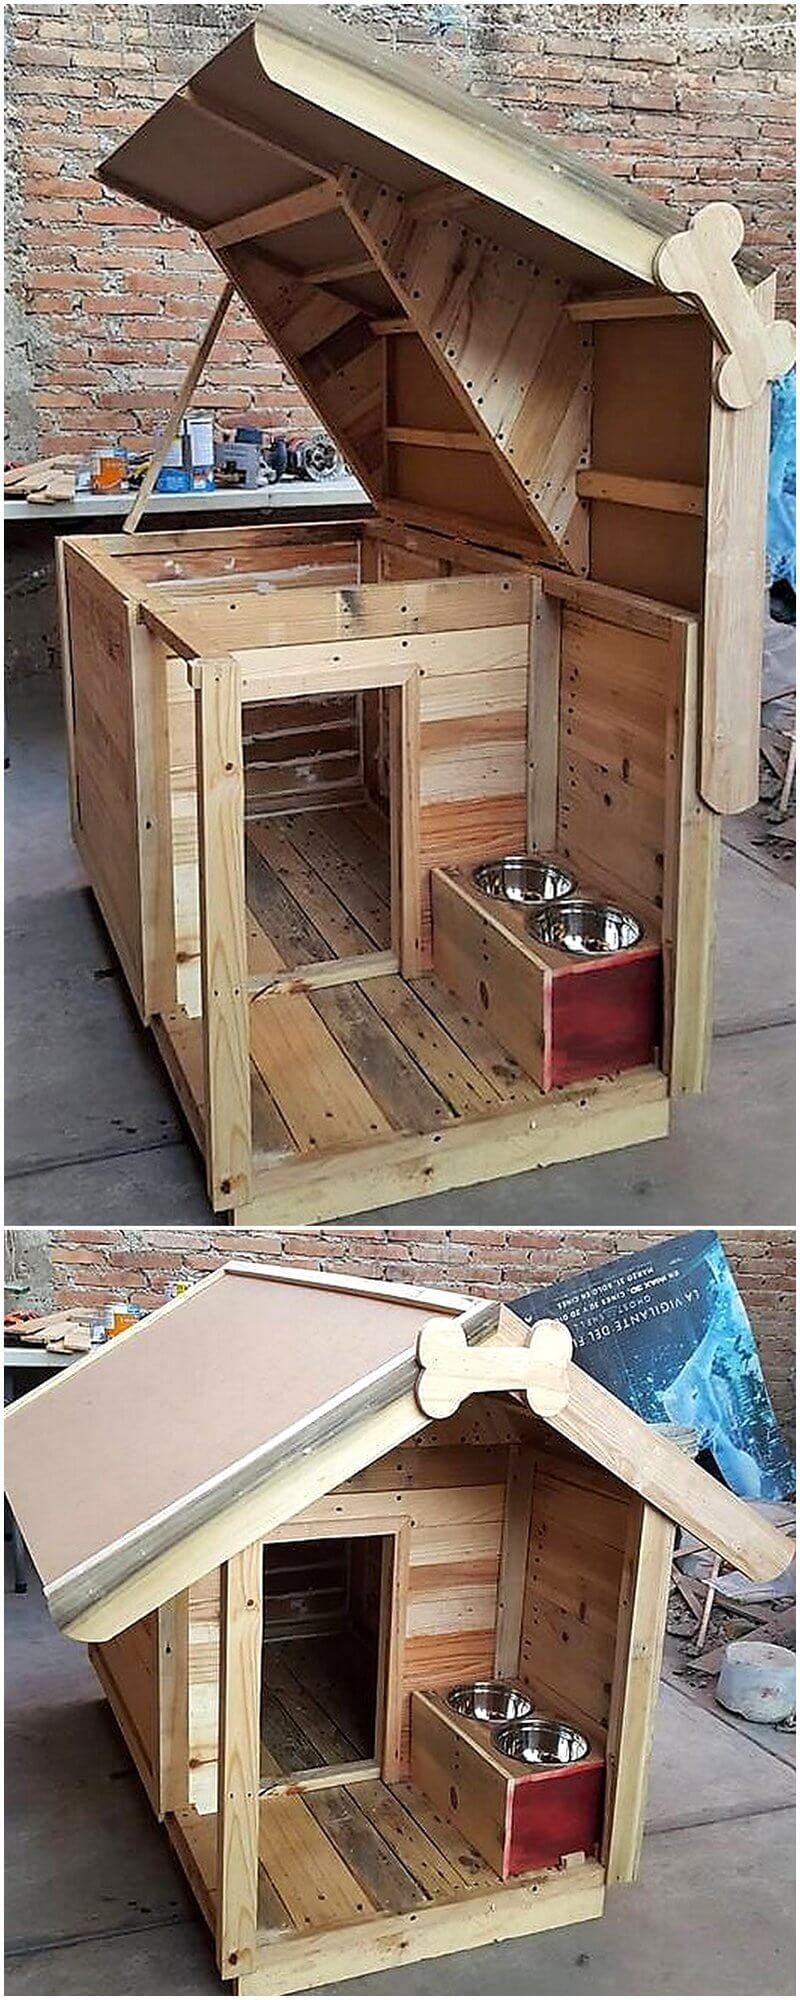 wood pallet dog house idea